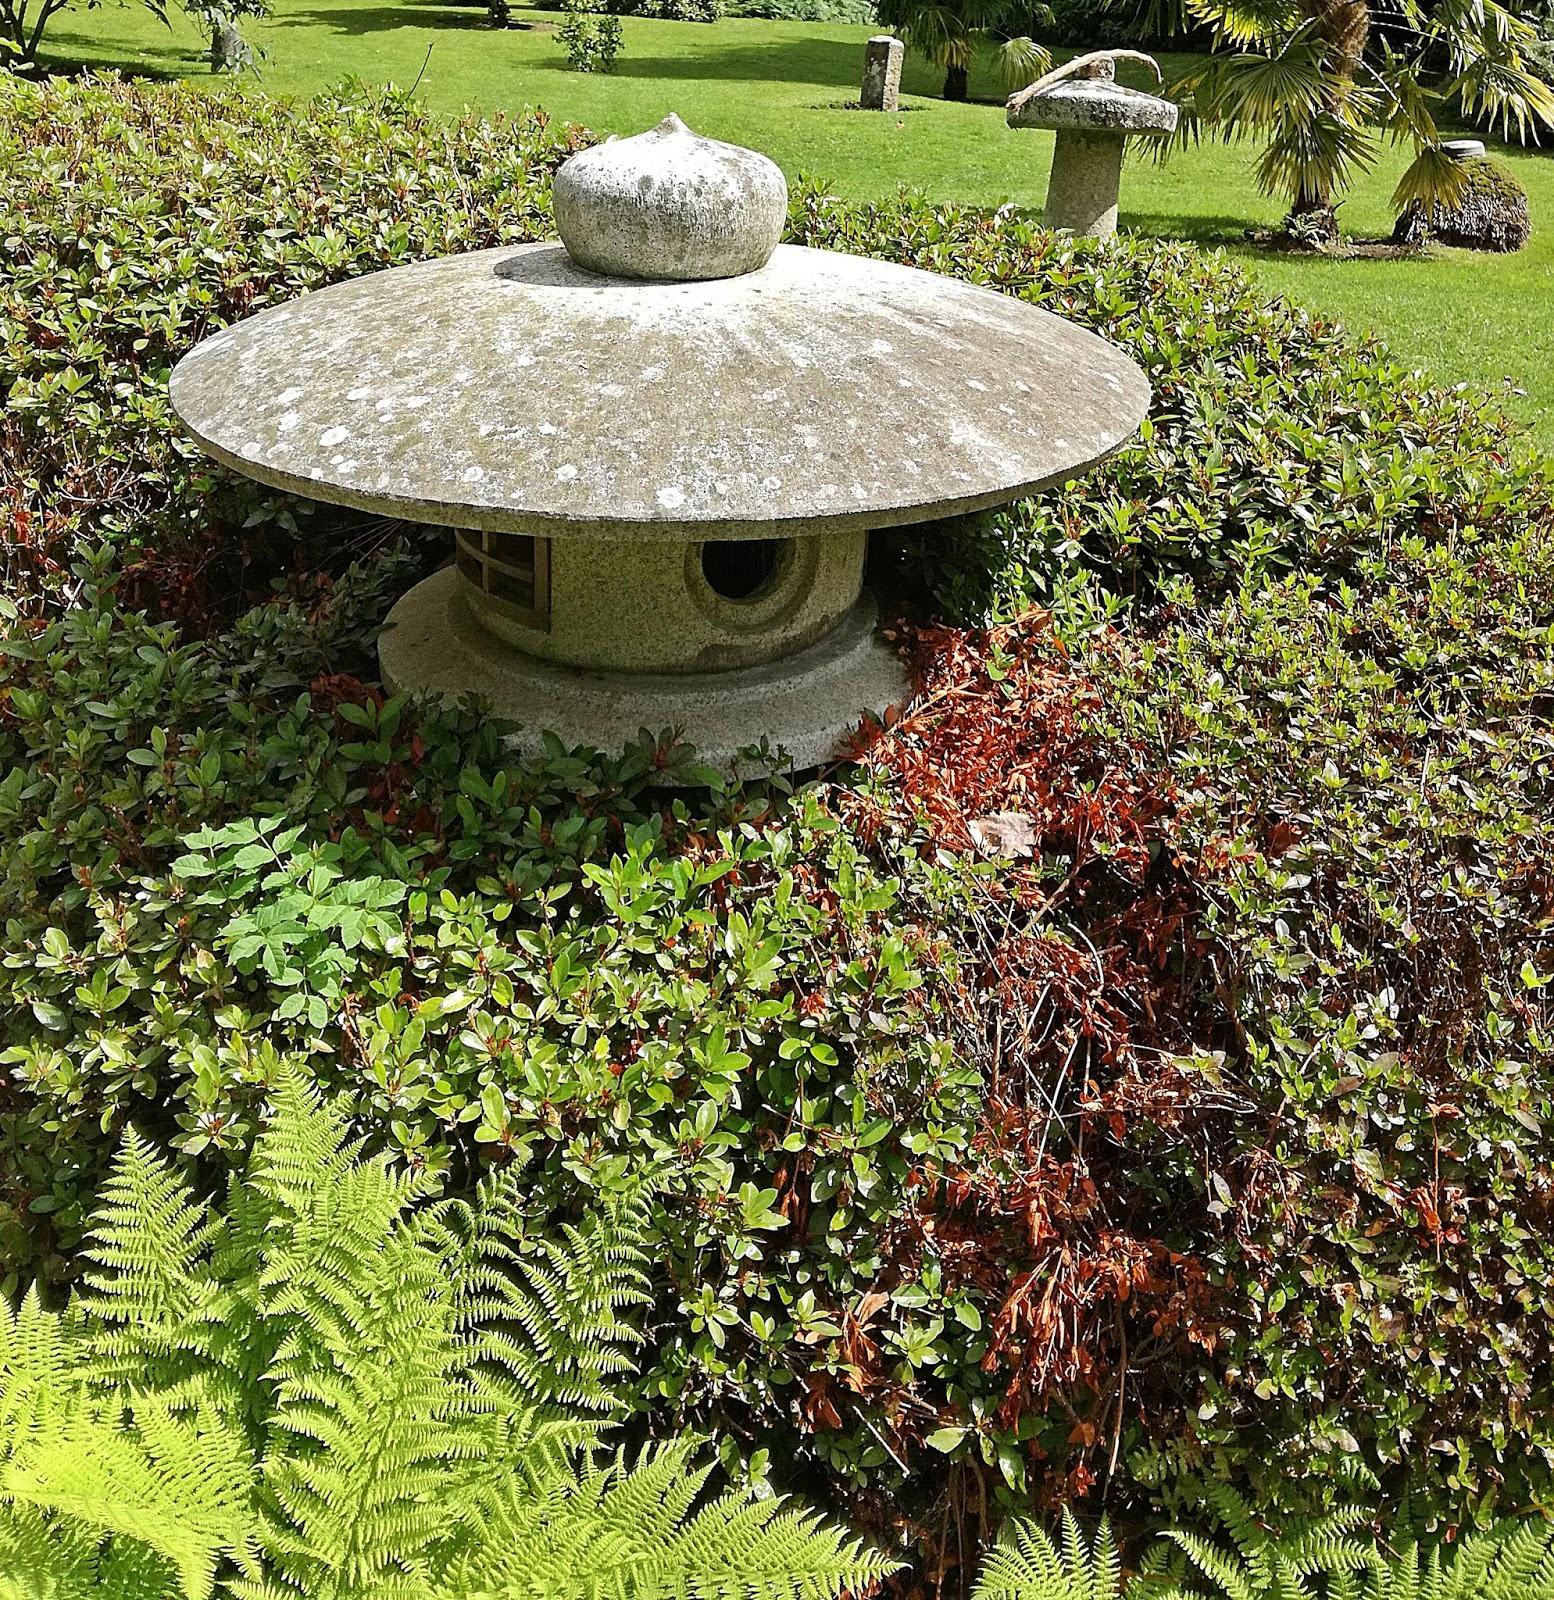 Carte allineate recensioni e testi 01 01 2018 02 01 2018 - Il giardino segreto banana yoshimoto ...